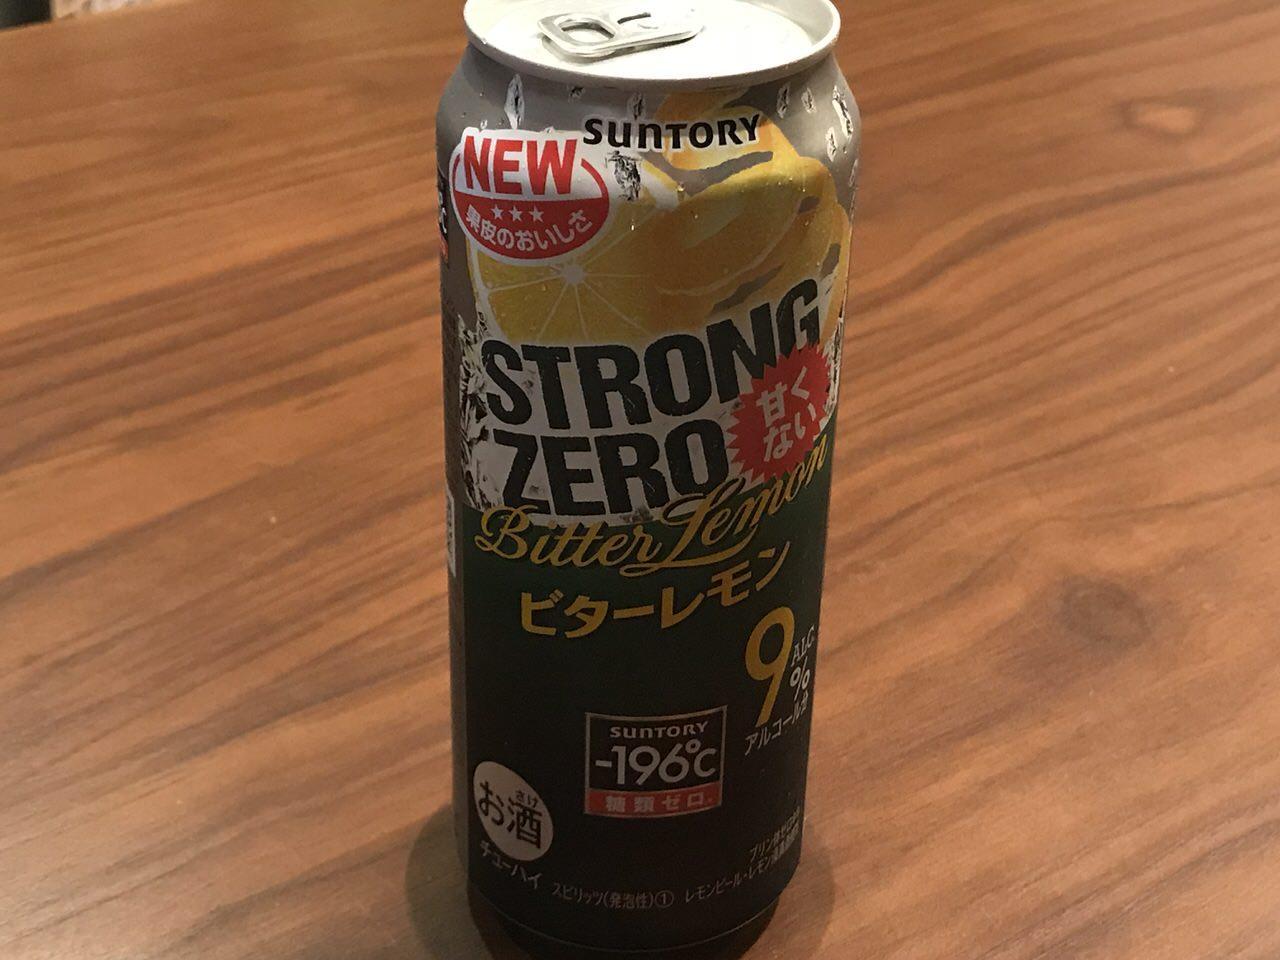 Strong zero bitter 7634